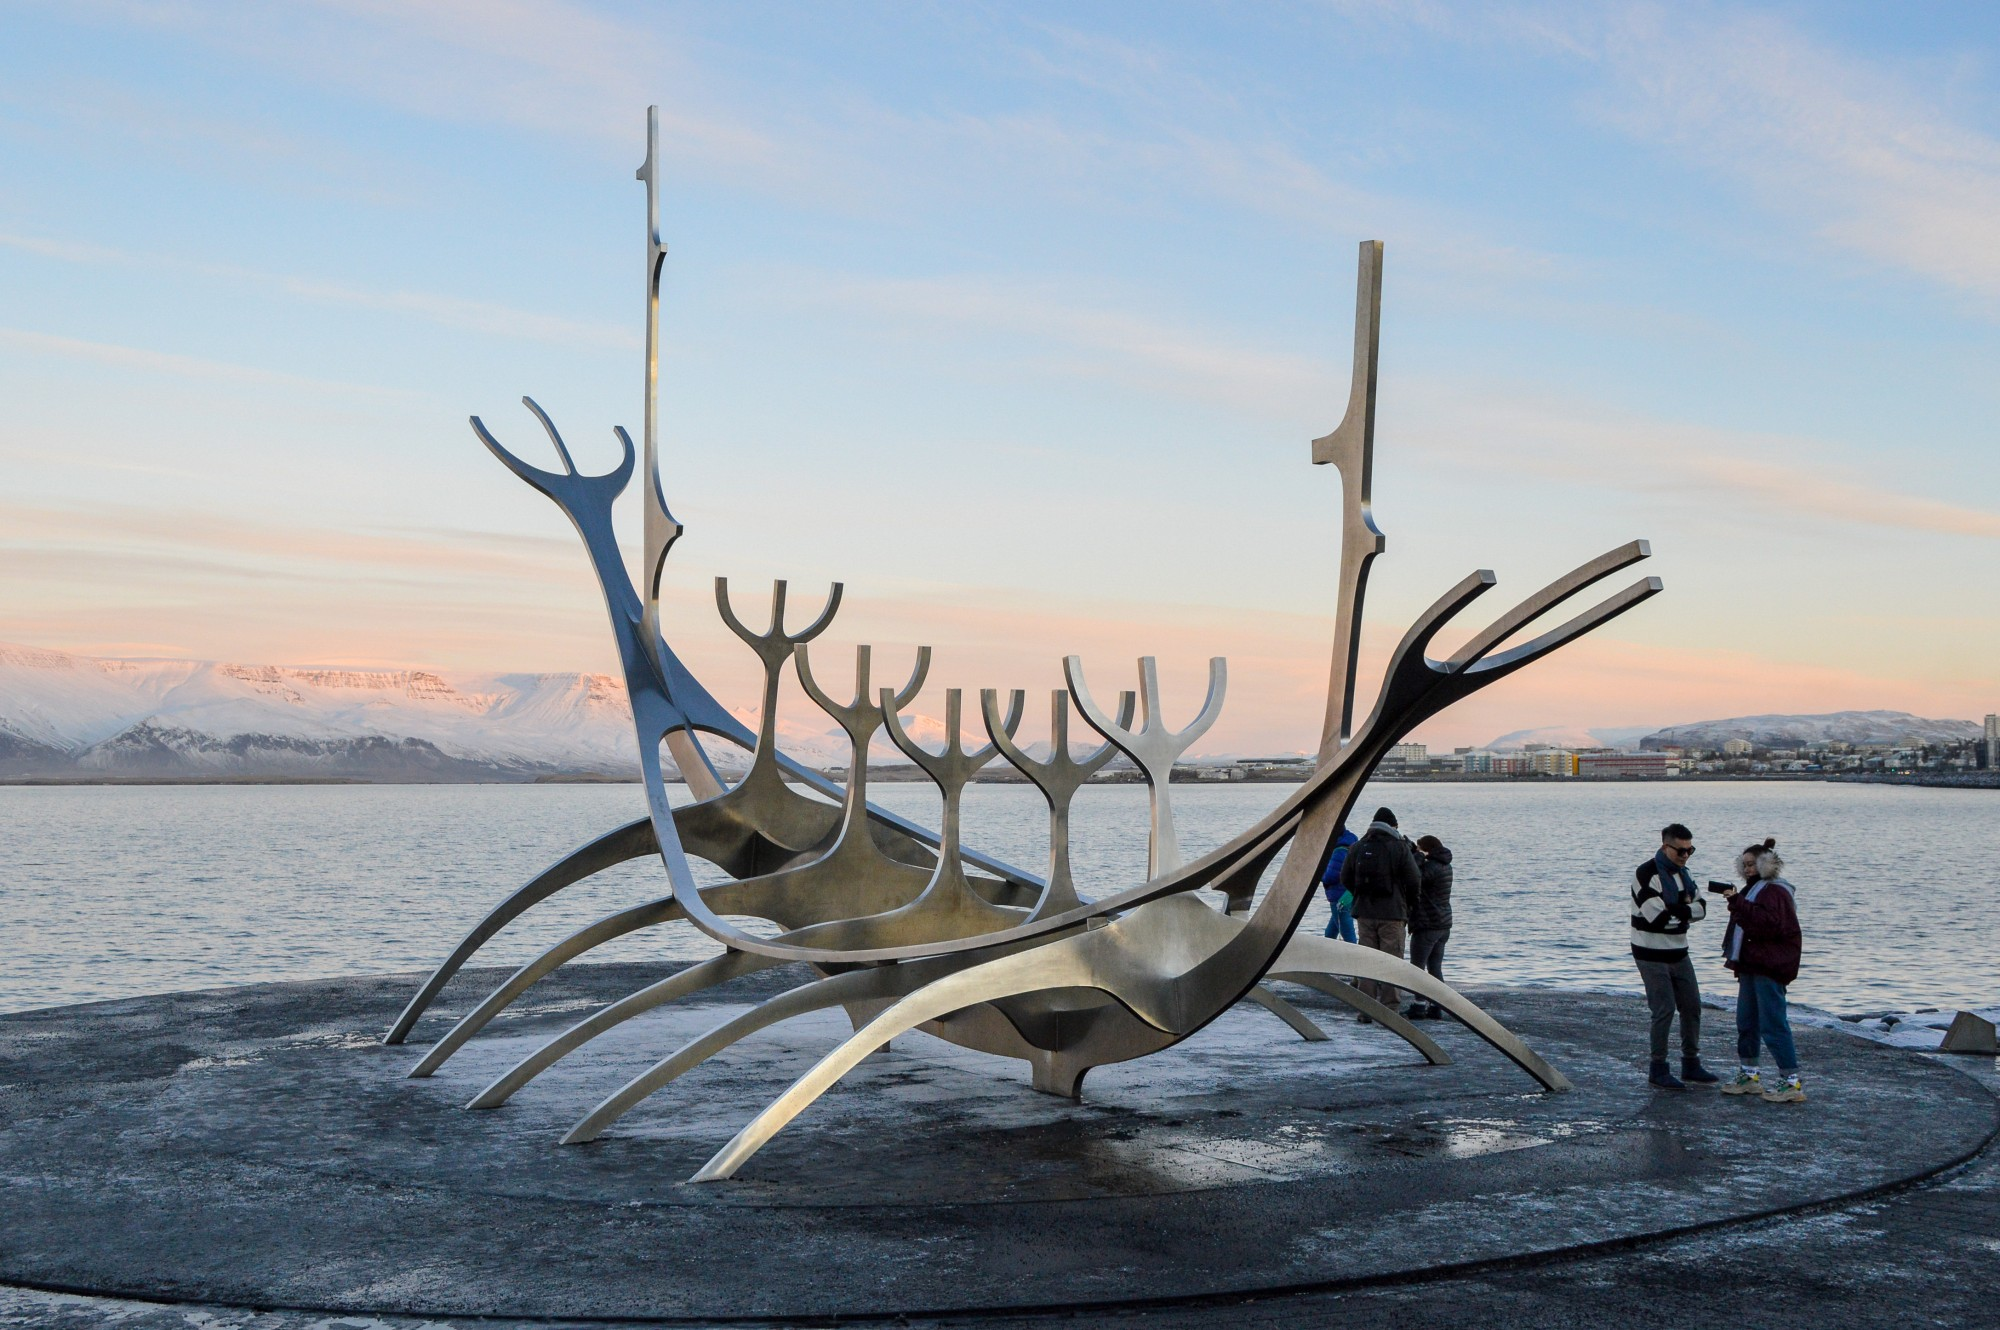 Visiting The Sun Voyager Viking Boat Sculpture in Reykjavik